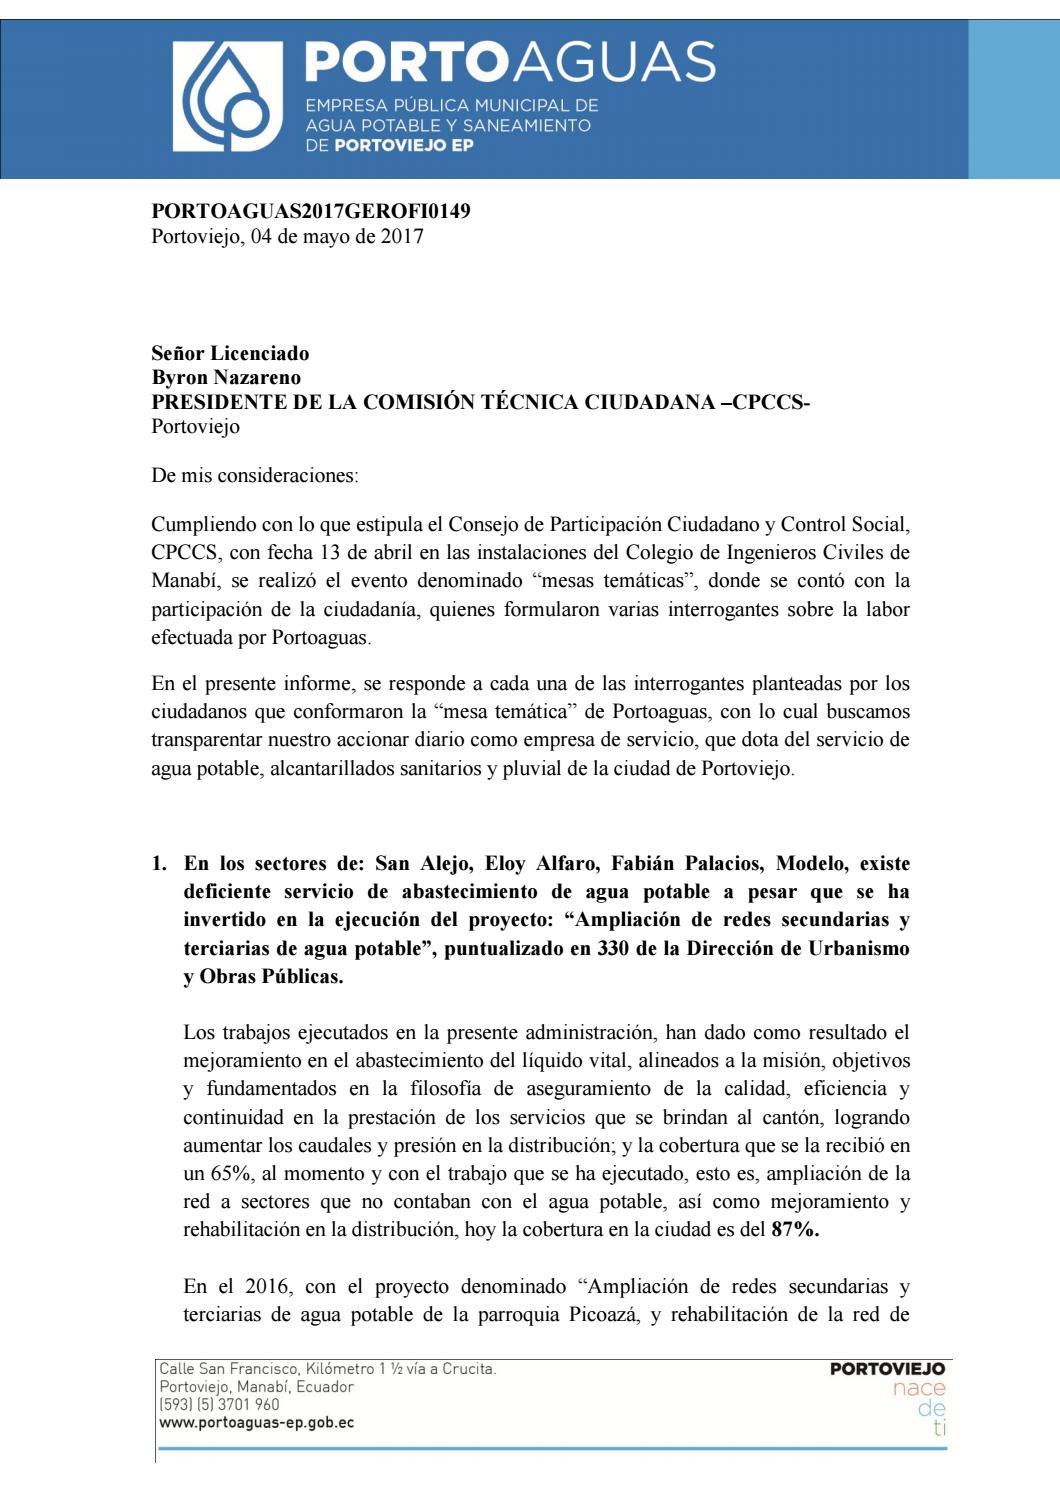 Informe Gerente by PORTOAGUAS - issuu